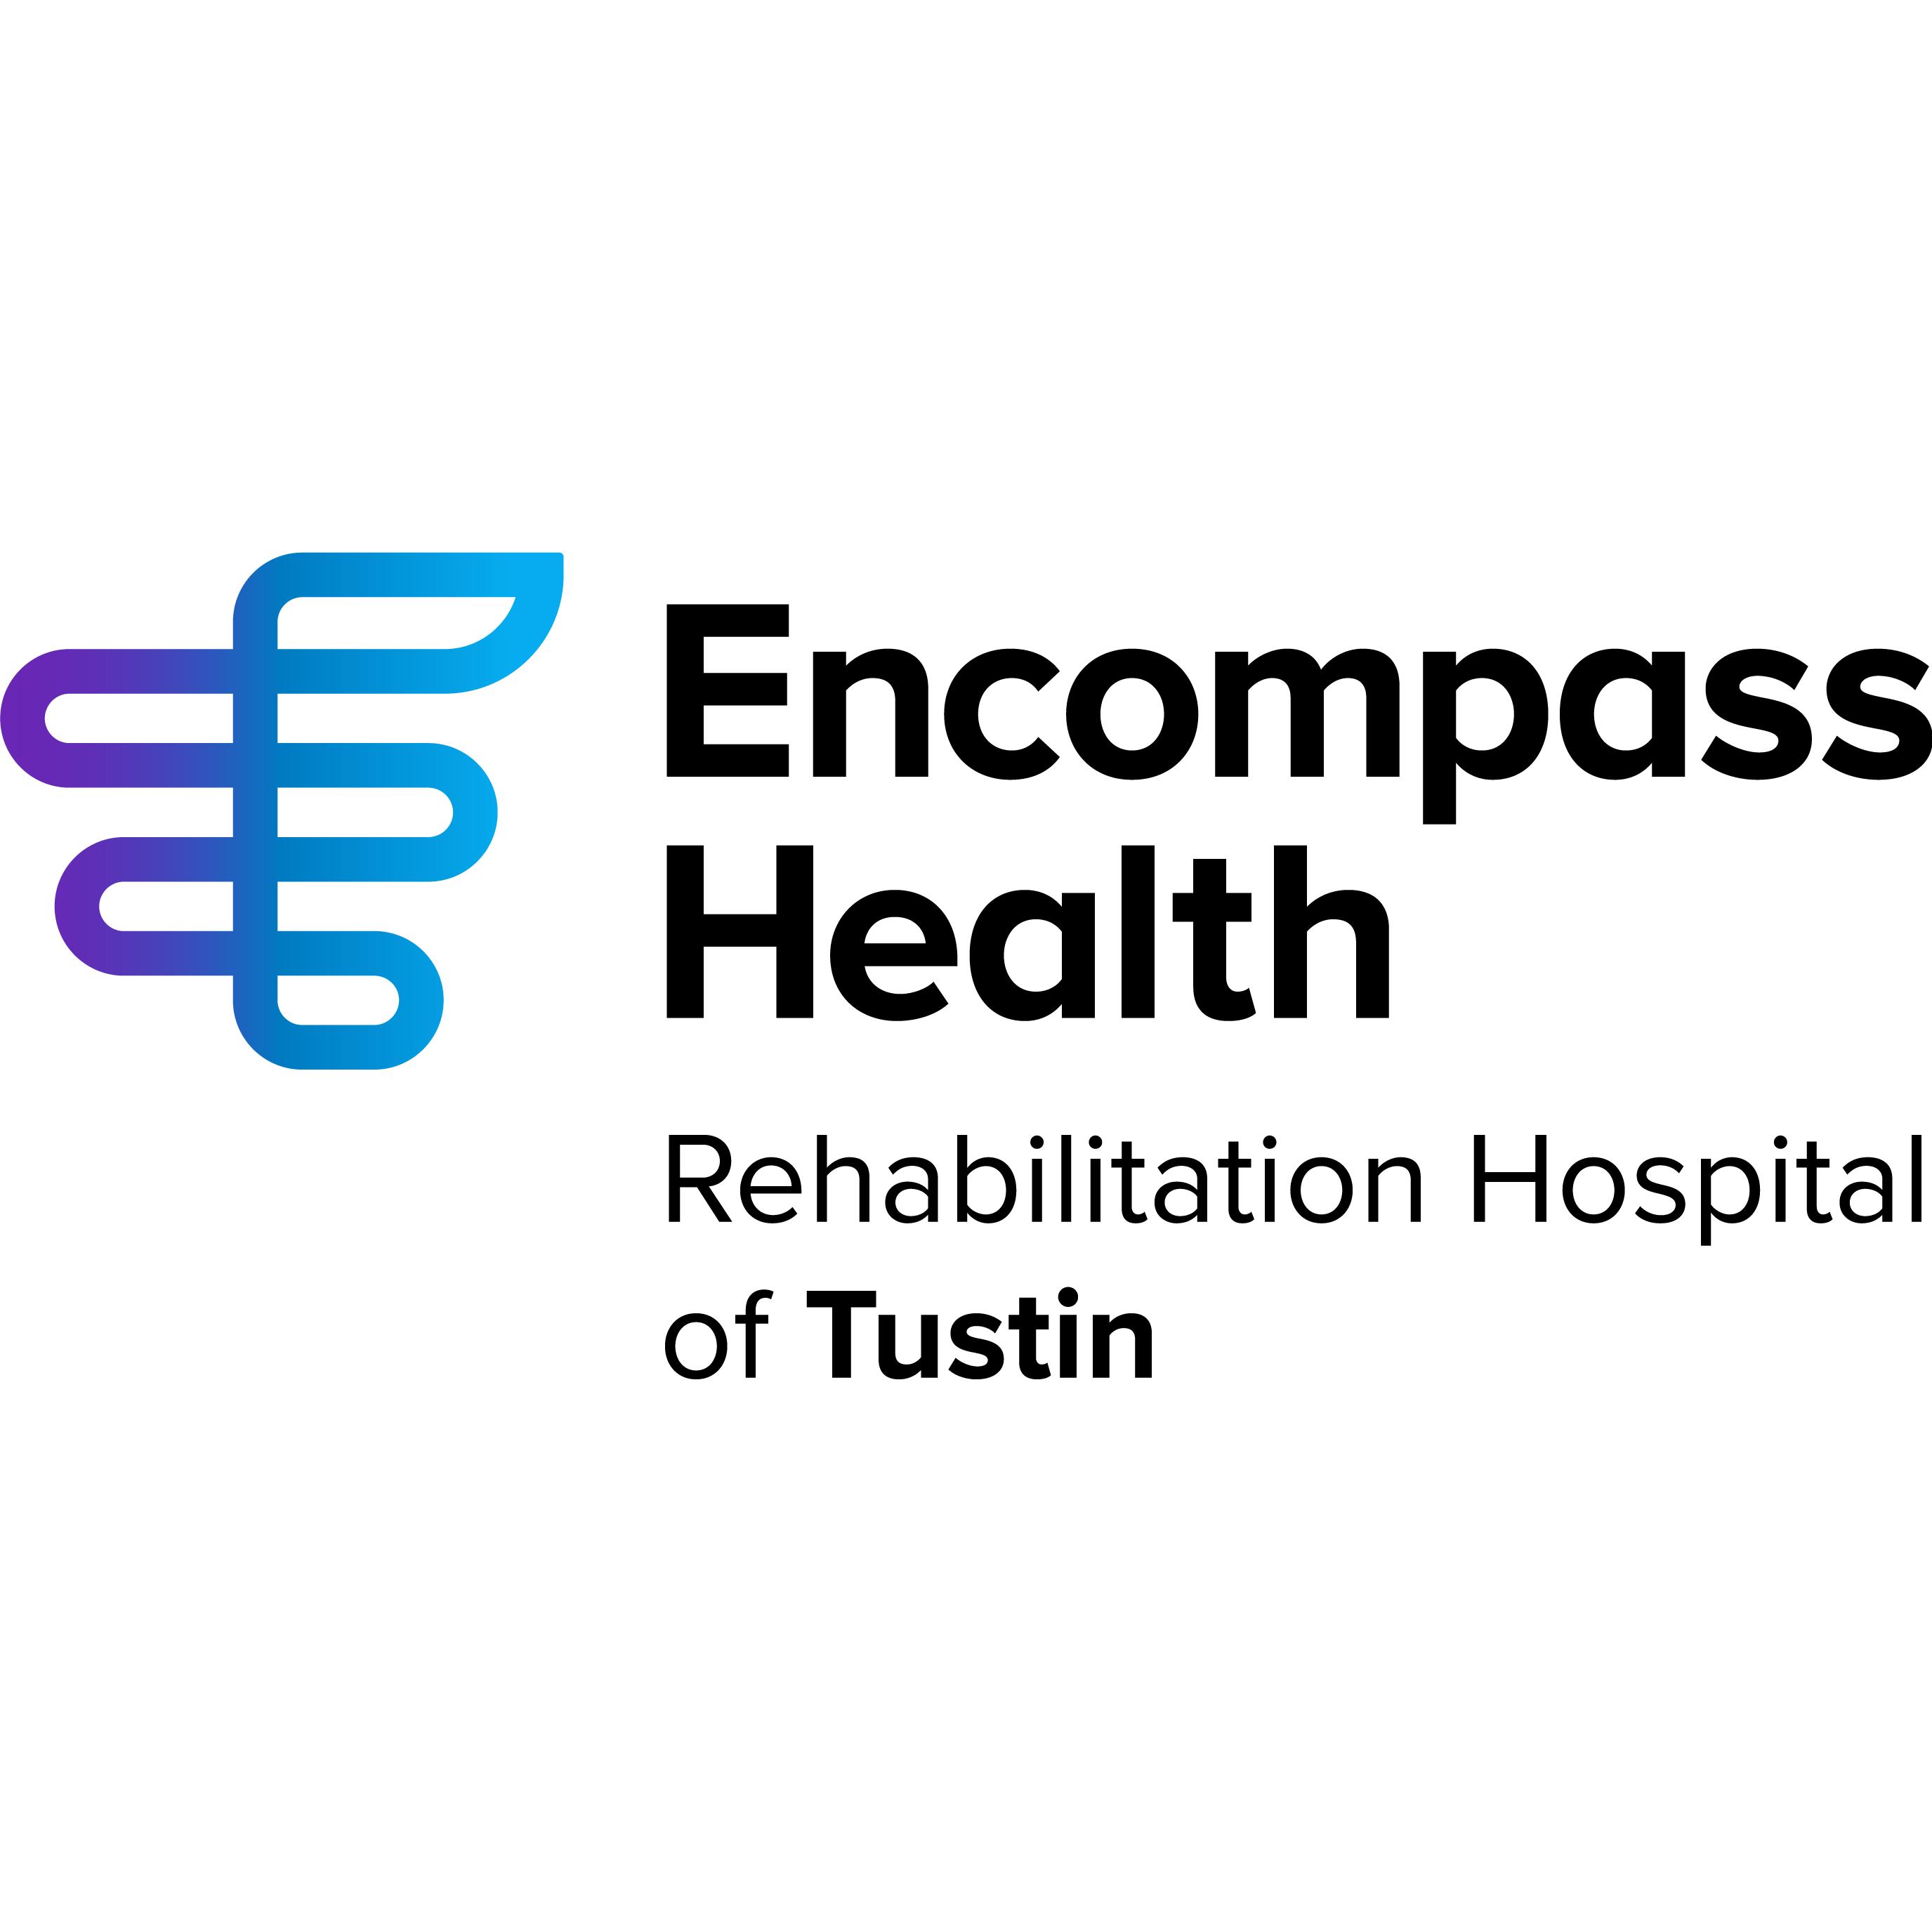 Encompass Health Rehabilitation Hospital of Tustin